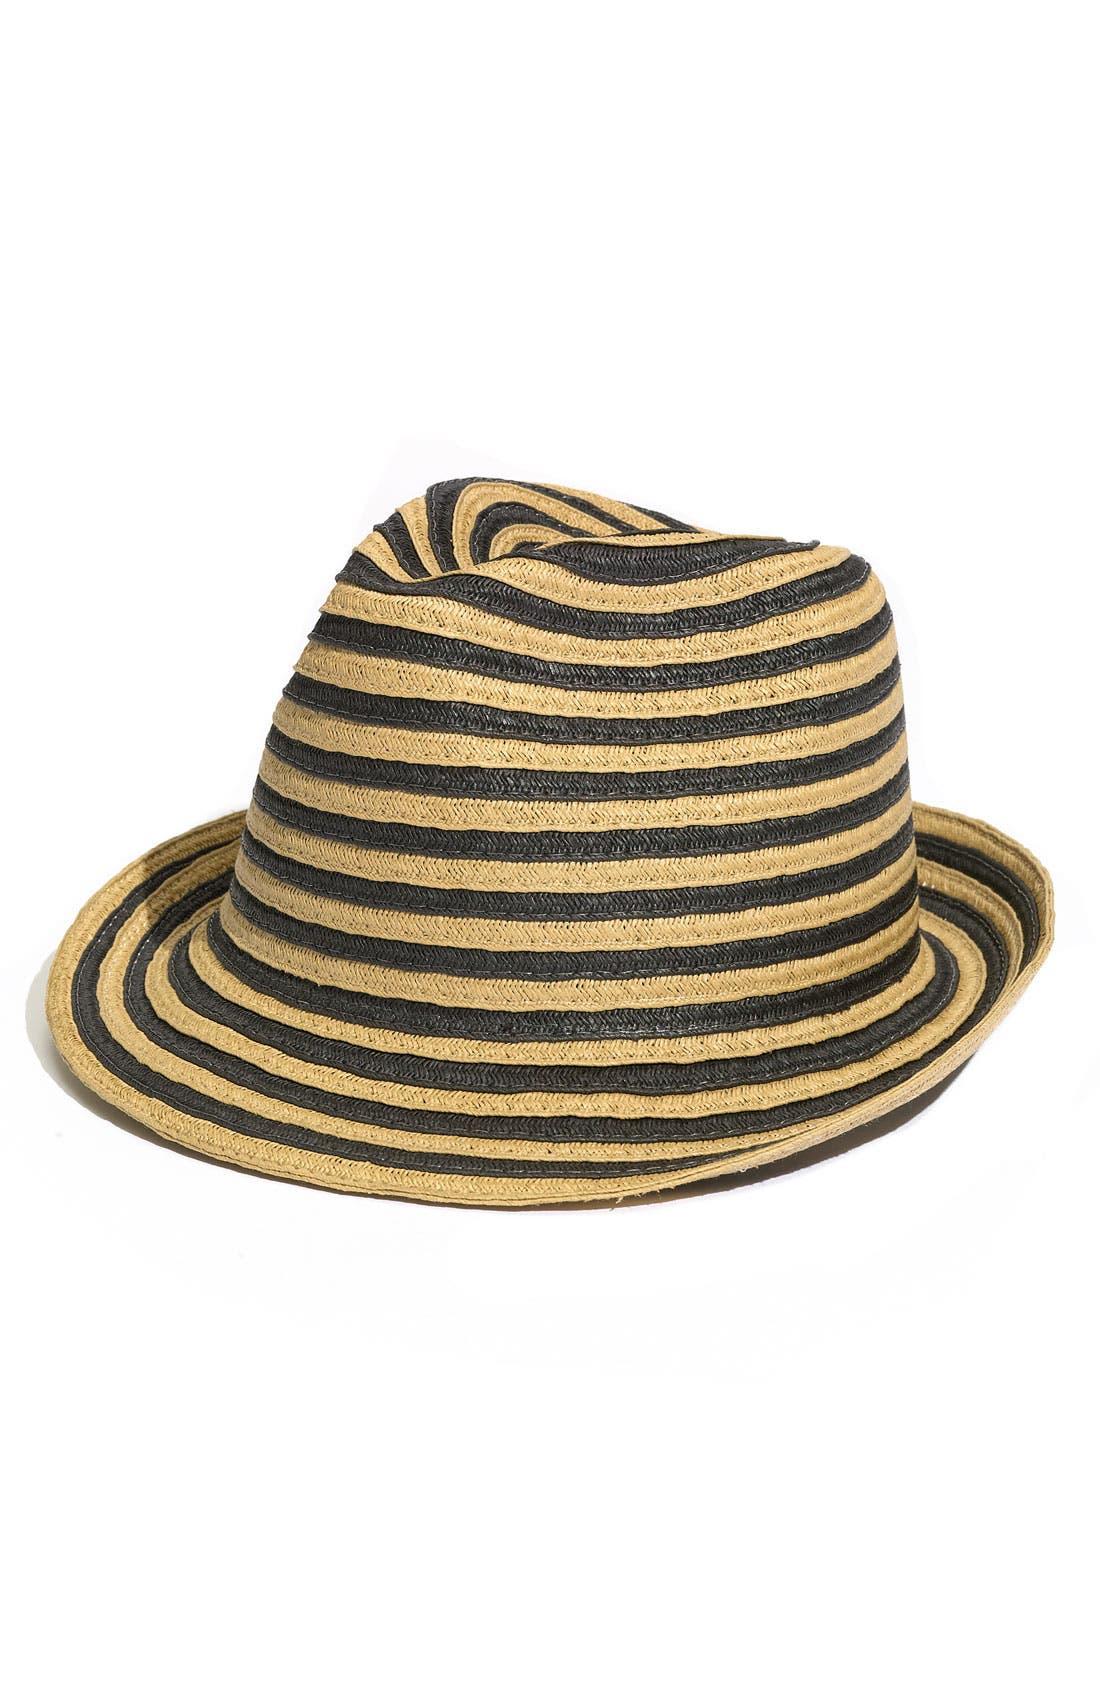 Alternate Image 1 Selected - Sonia Rykiel 'Capeline' Straw Hat